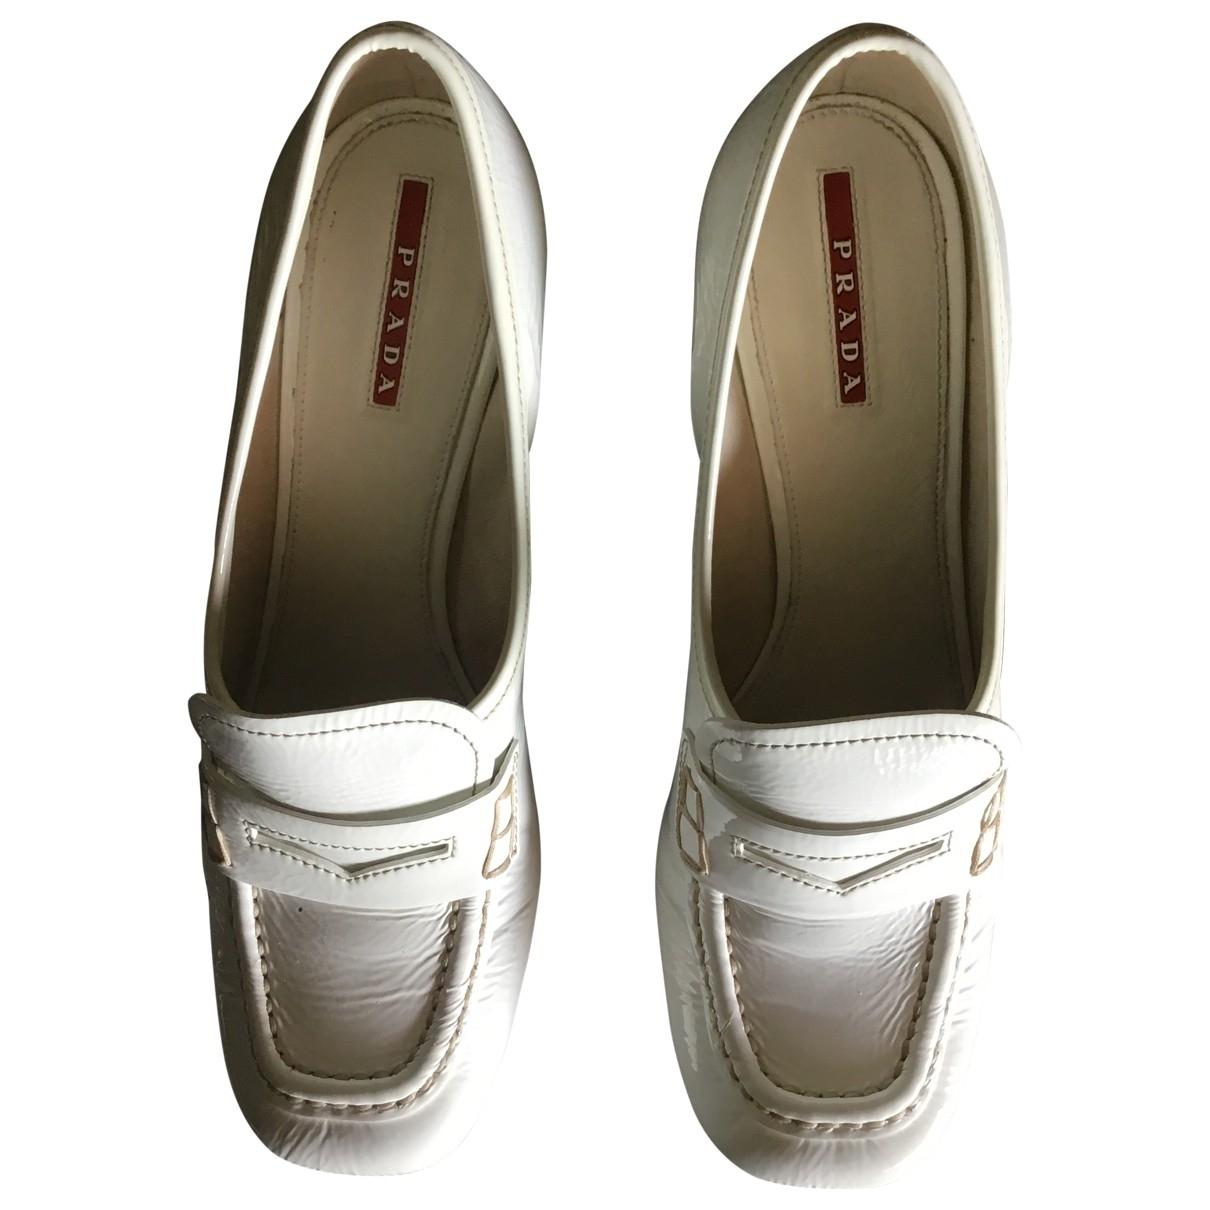 Prada \N White Patent leather Flats for Women 38.5 EU